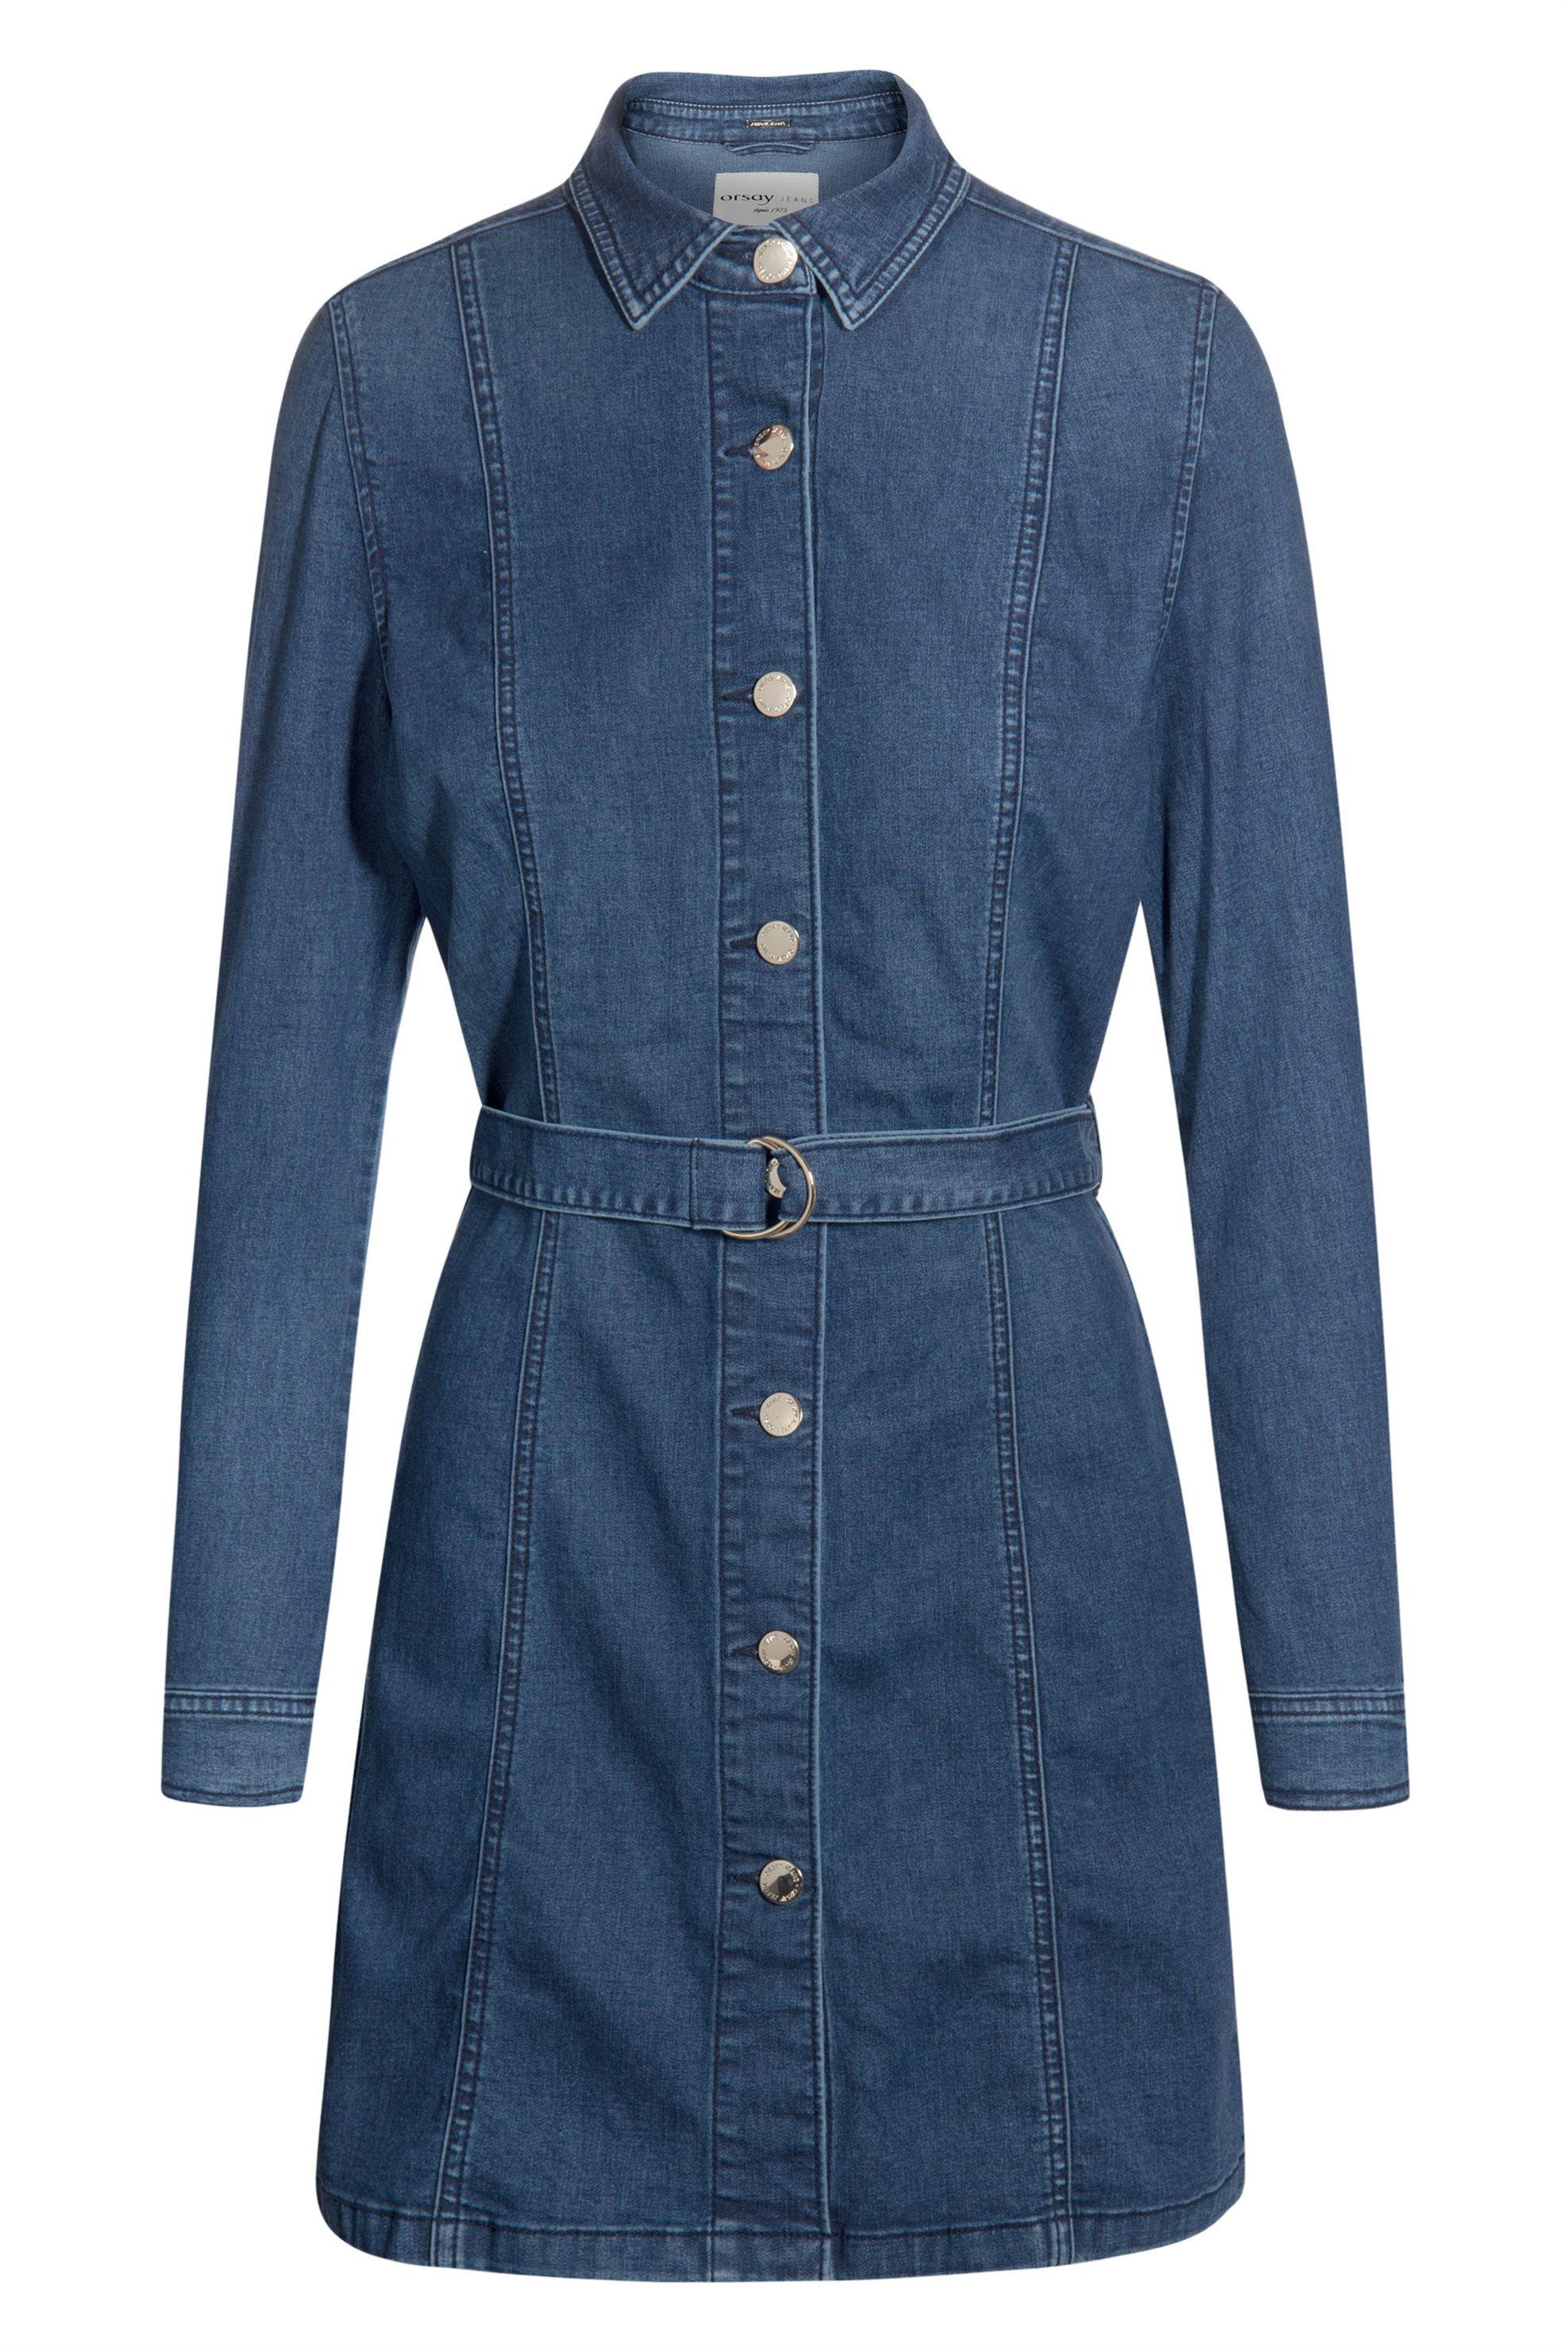 9f60ac2ba526 Γυναικεία   Ρούχα   Φορέματα   Καθημερινά   30935 SD Μίνι φόρεμα ...